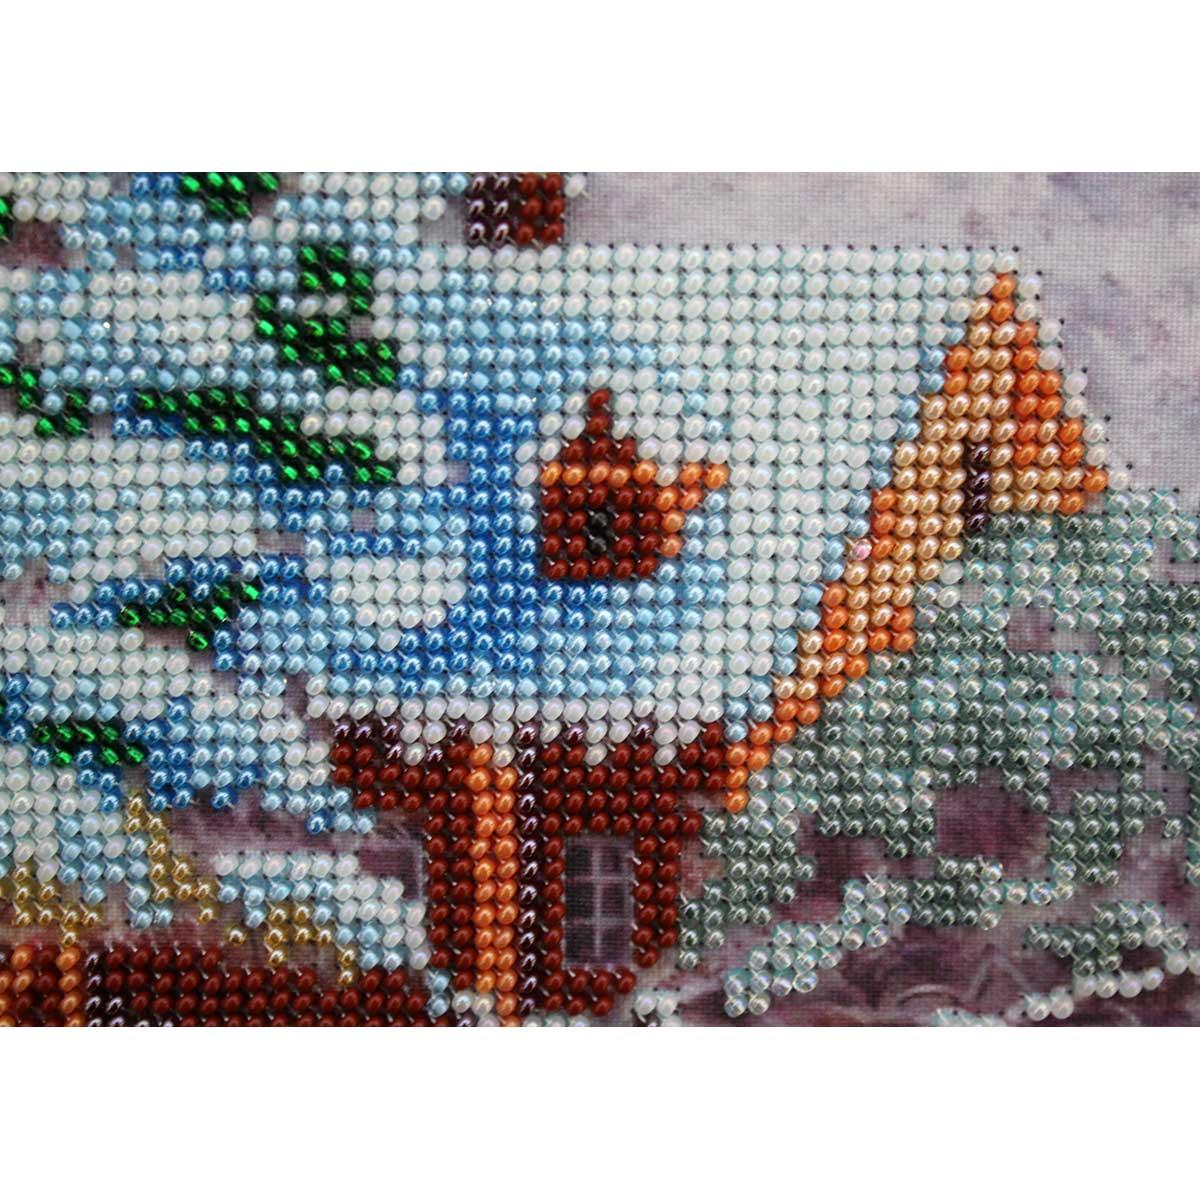 "Набор для вышивания бисером БН-3131 ""Сударыня зима"", 36х30 см, Hobby&Pro"